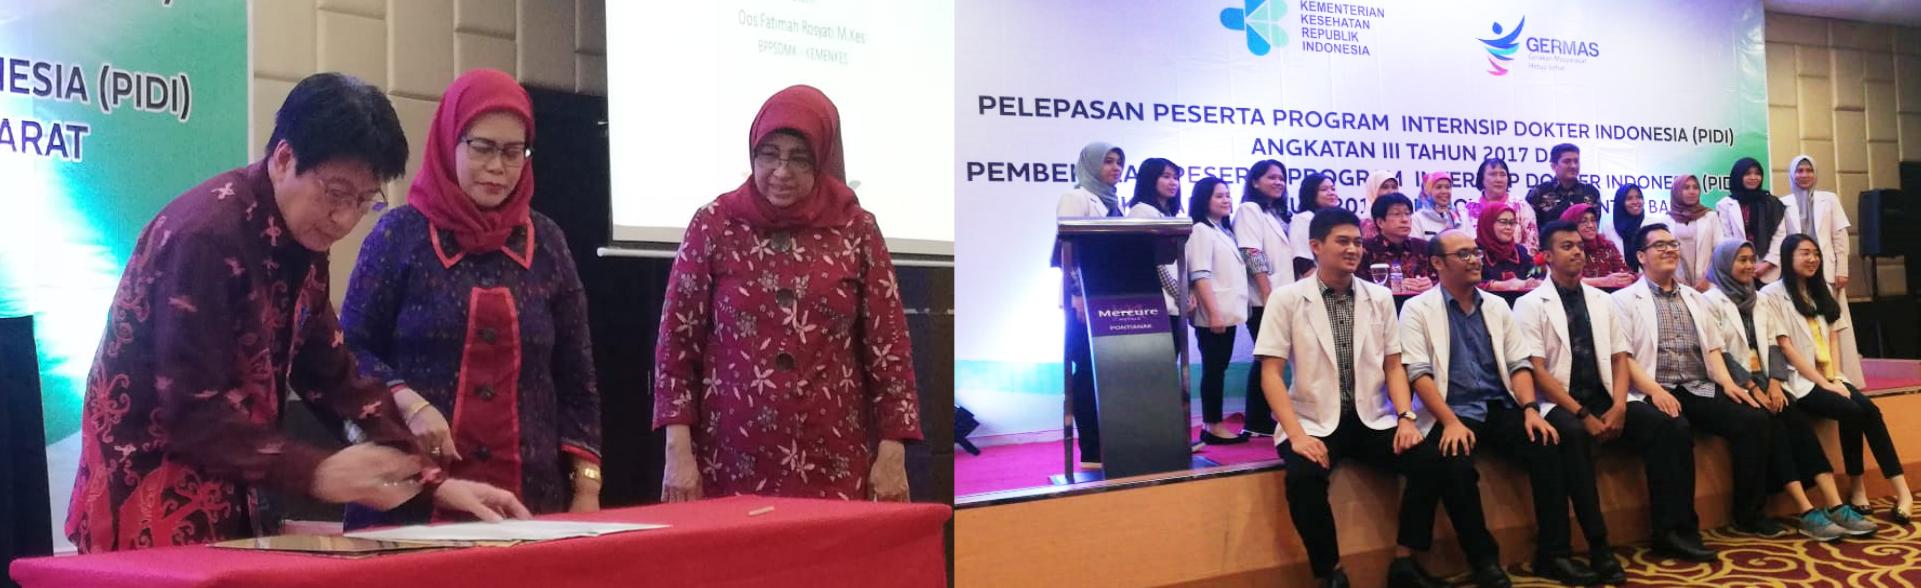 Program Internsip Dokter Indonesia